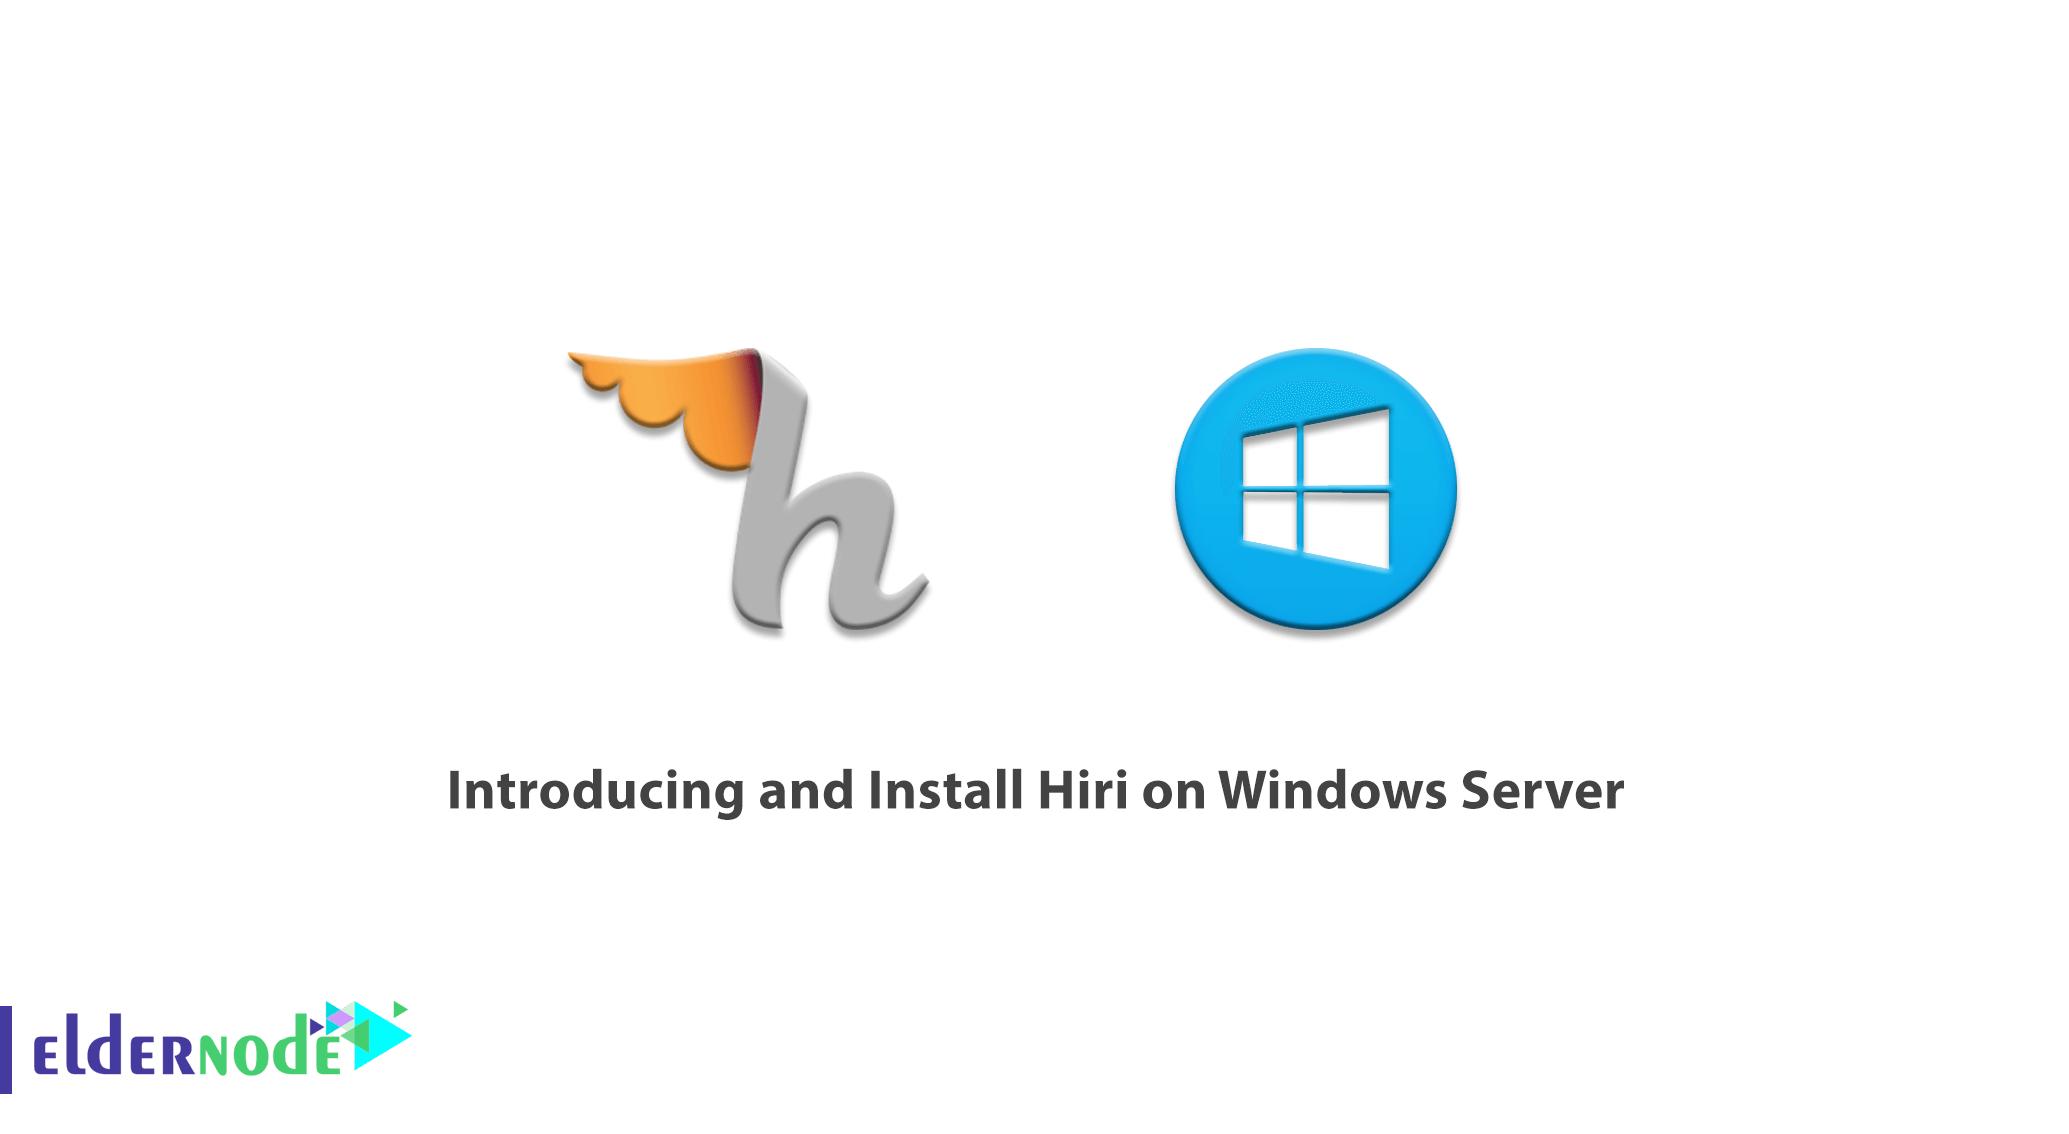 Introducing and Install Hiri on Windows Server